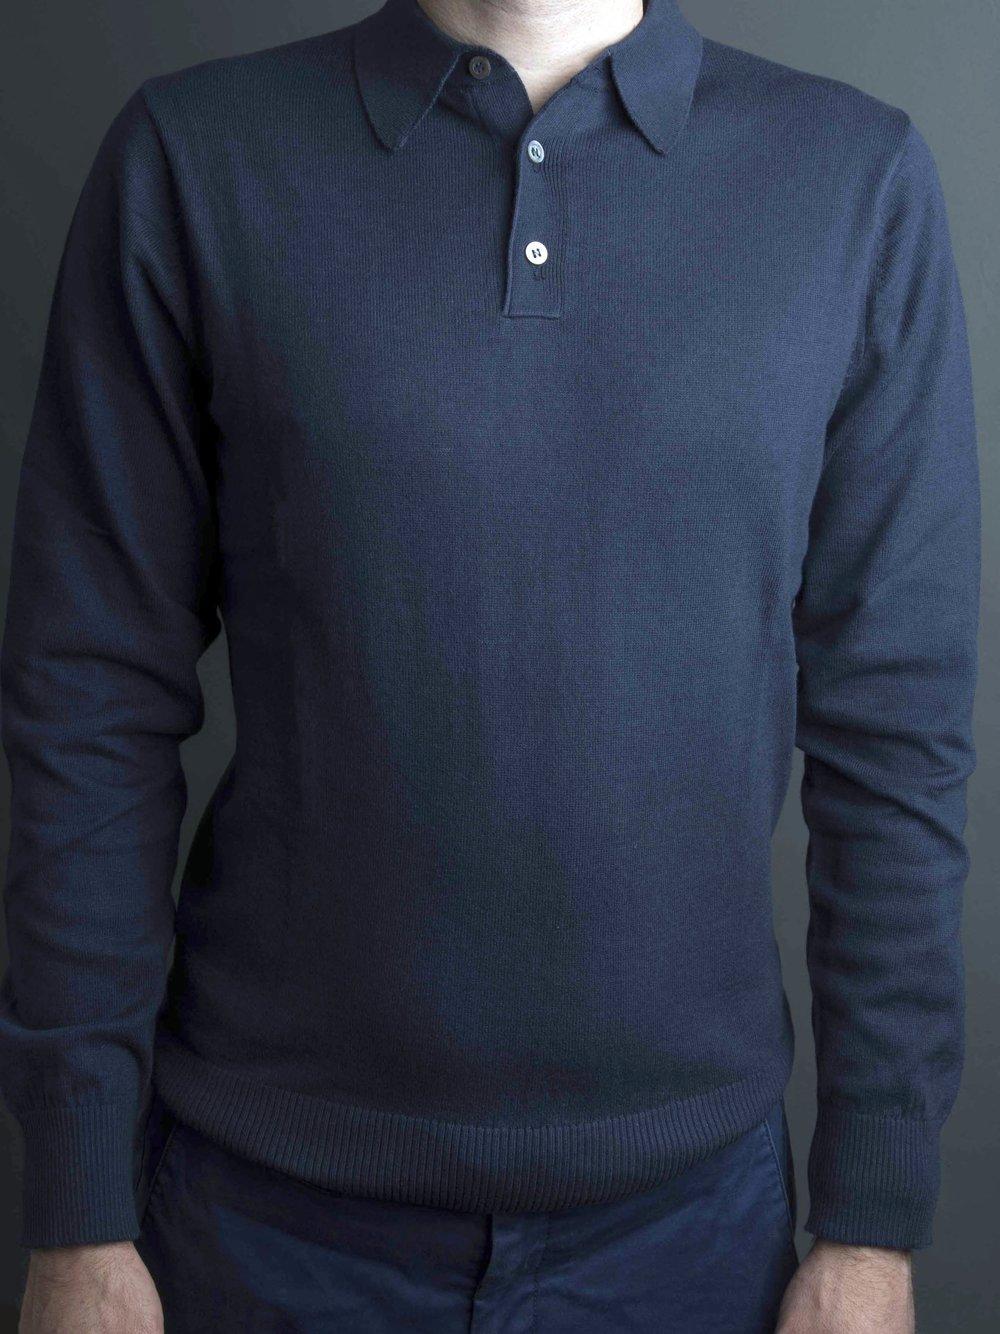 Man's blue Franco Ponti sweater with collar.jpg